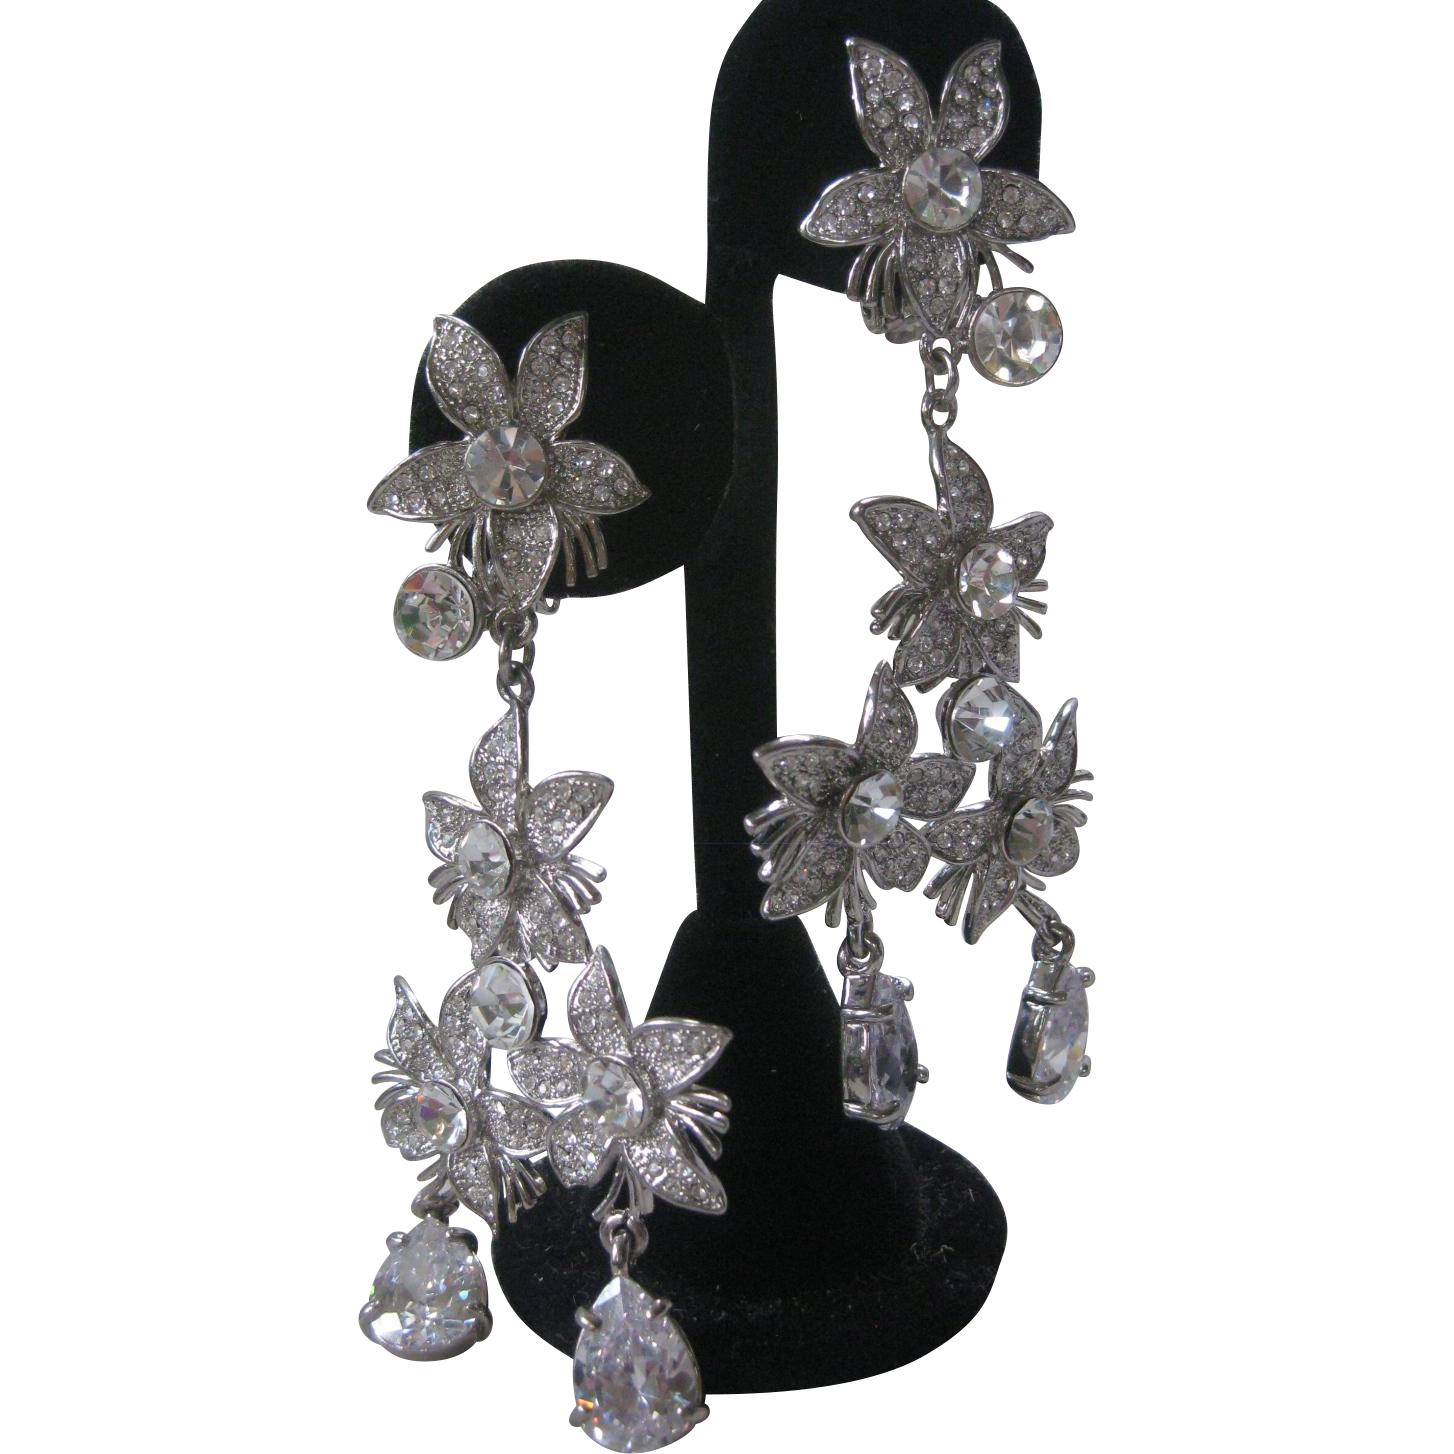 Zillions Of Clear Stones Large Chandelier Vintage Earrings